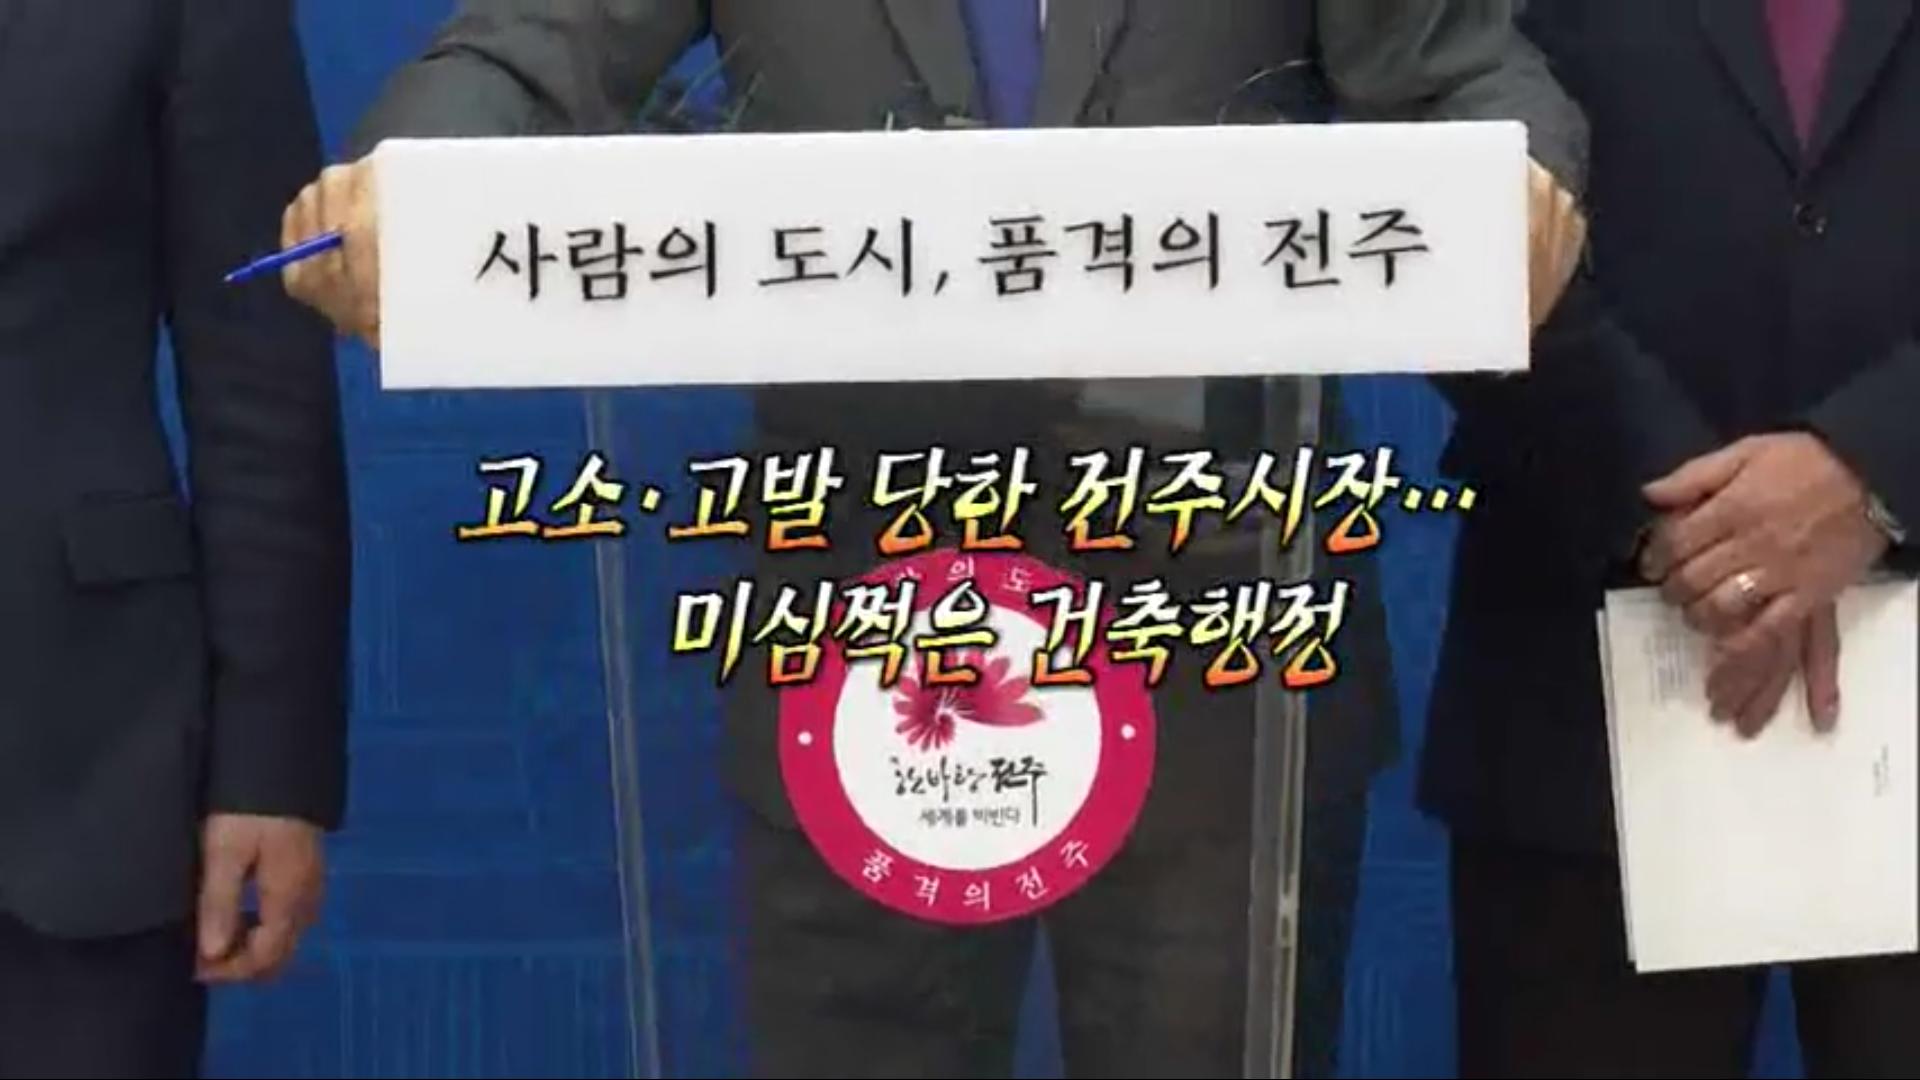 [19.5.3 JTV 현장스토리 판] 고소, 고발 당한 전주시장... 미심쩍은 건축행정1.png